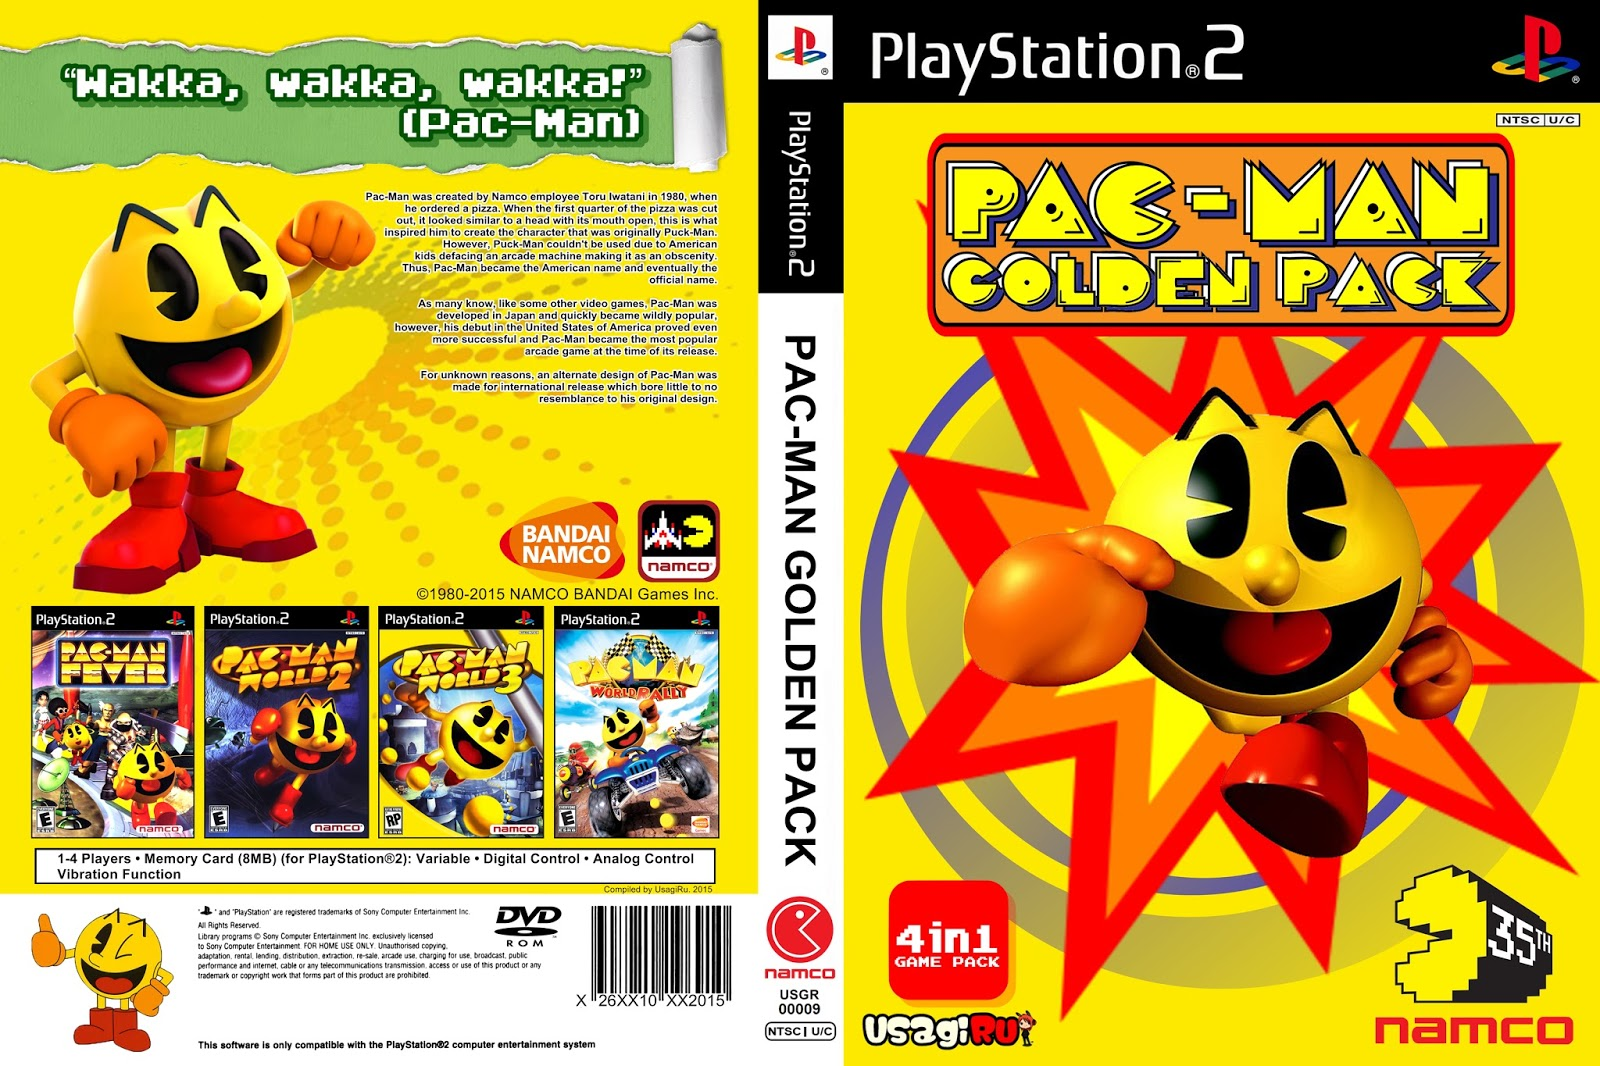 Pac Man Golden Pack No Playstation 2 Blog Do Ruivo